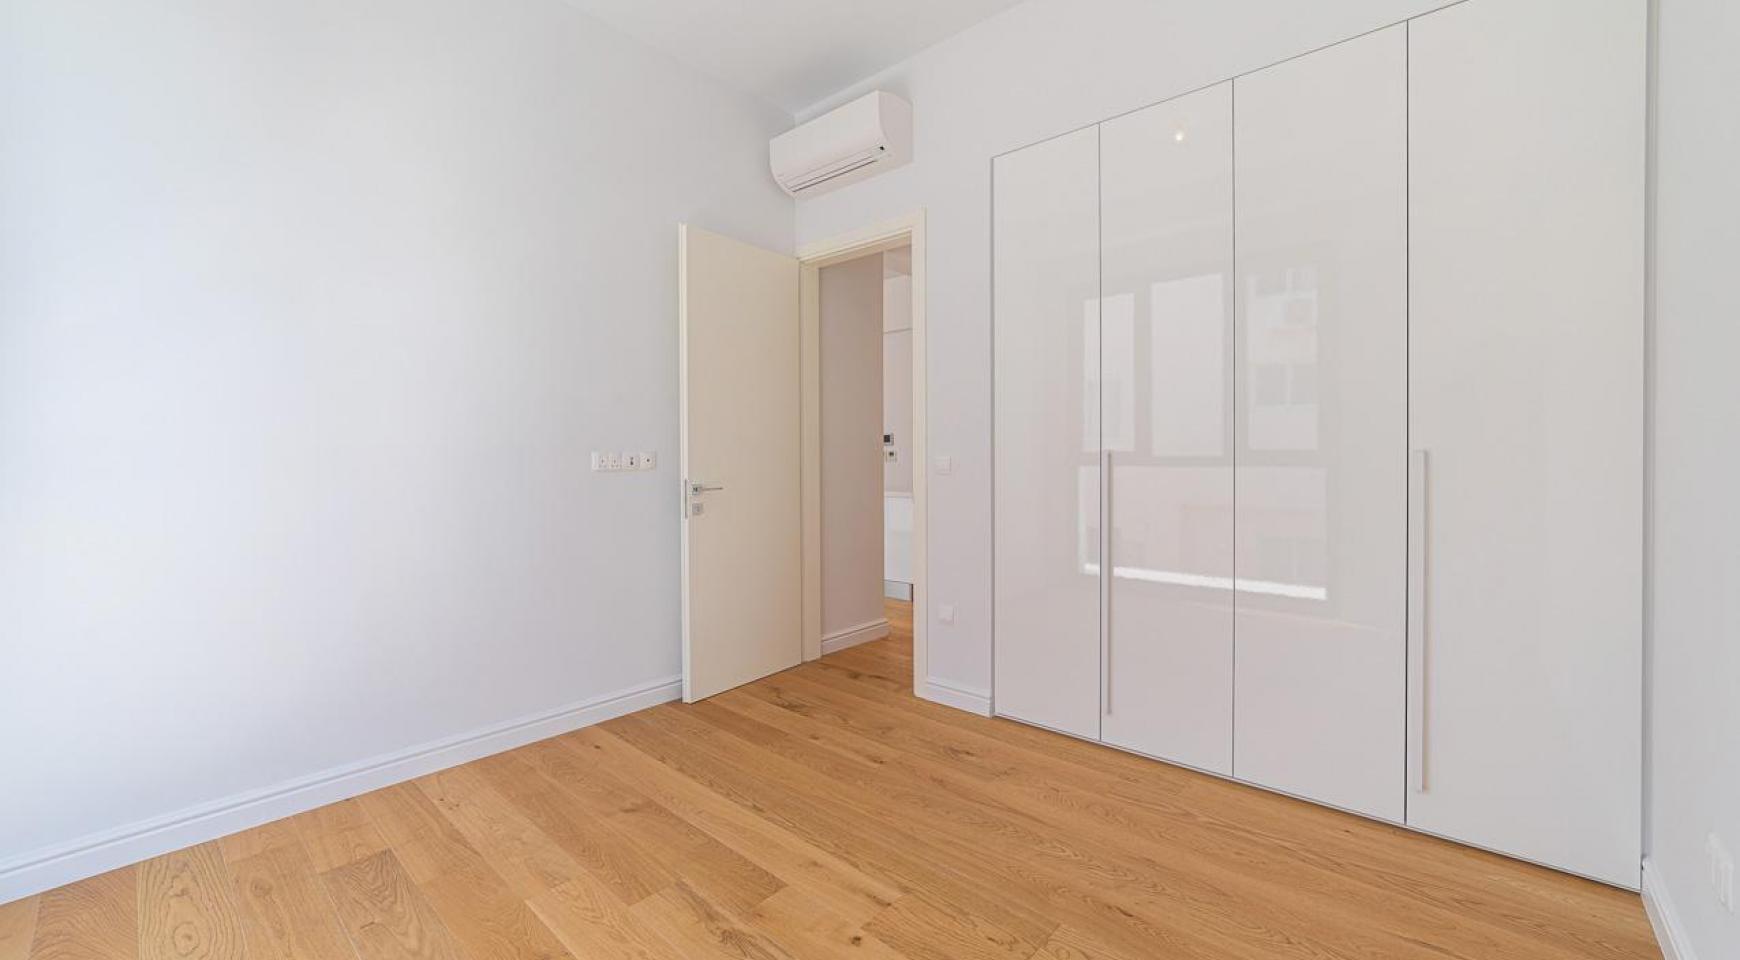 Malibu Residence. Modern One Bedroom Apartment 101 in Potamos Germasogeia - 37